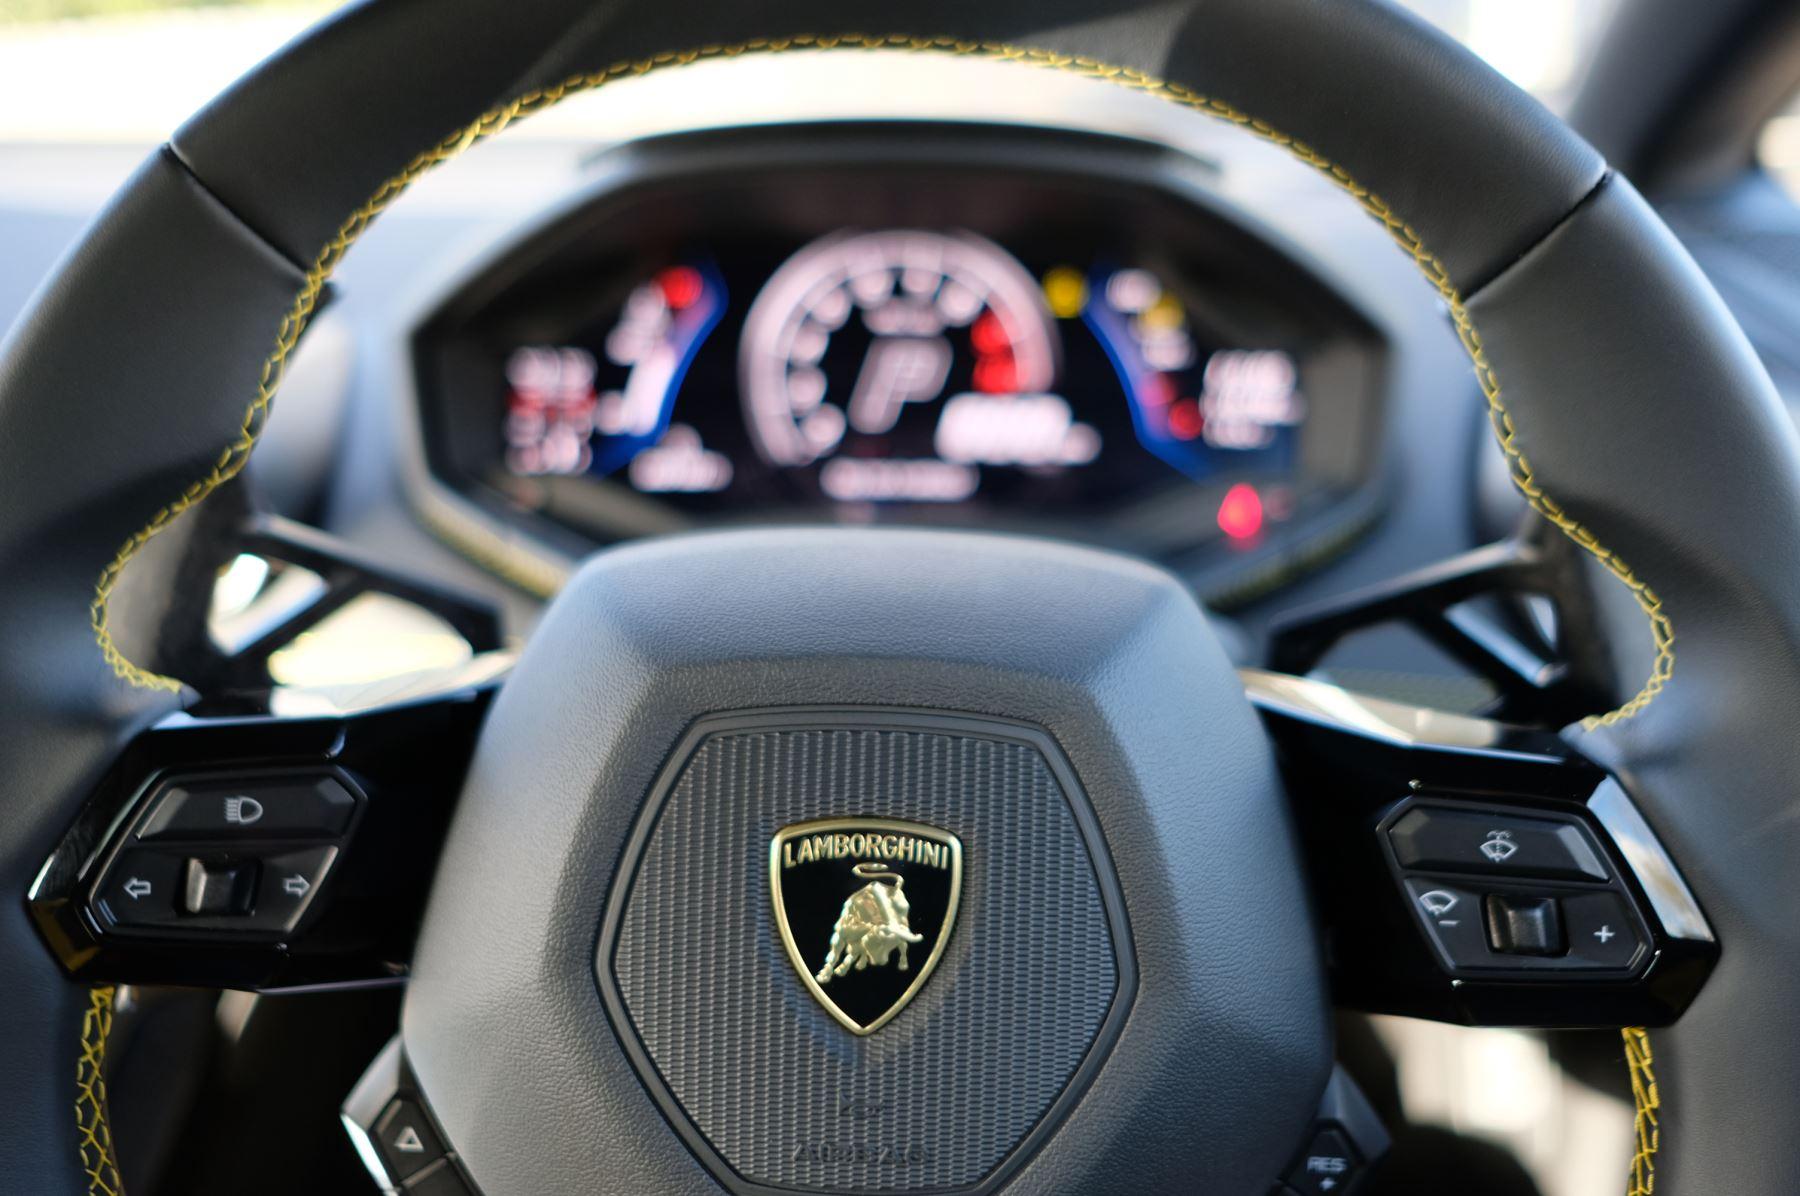 Lamborghini Huracan EVO 5.2 V10 610 2dr Auto RWD image 16